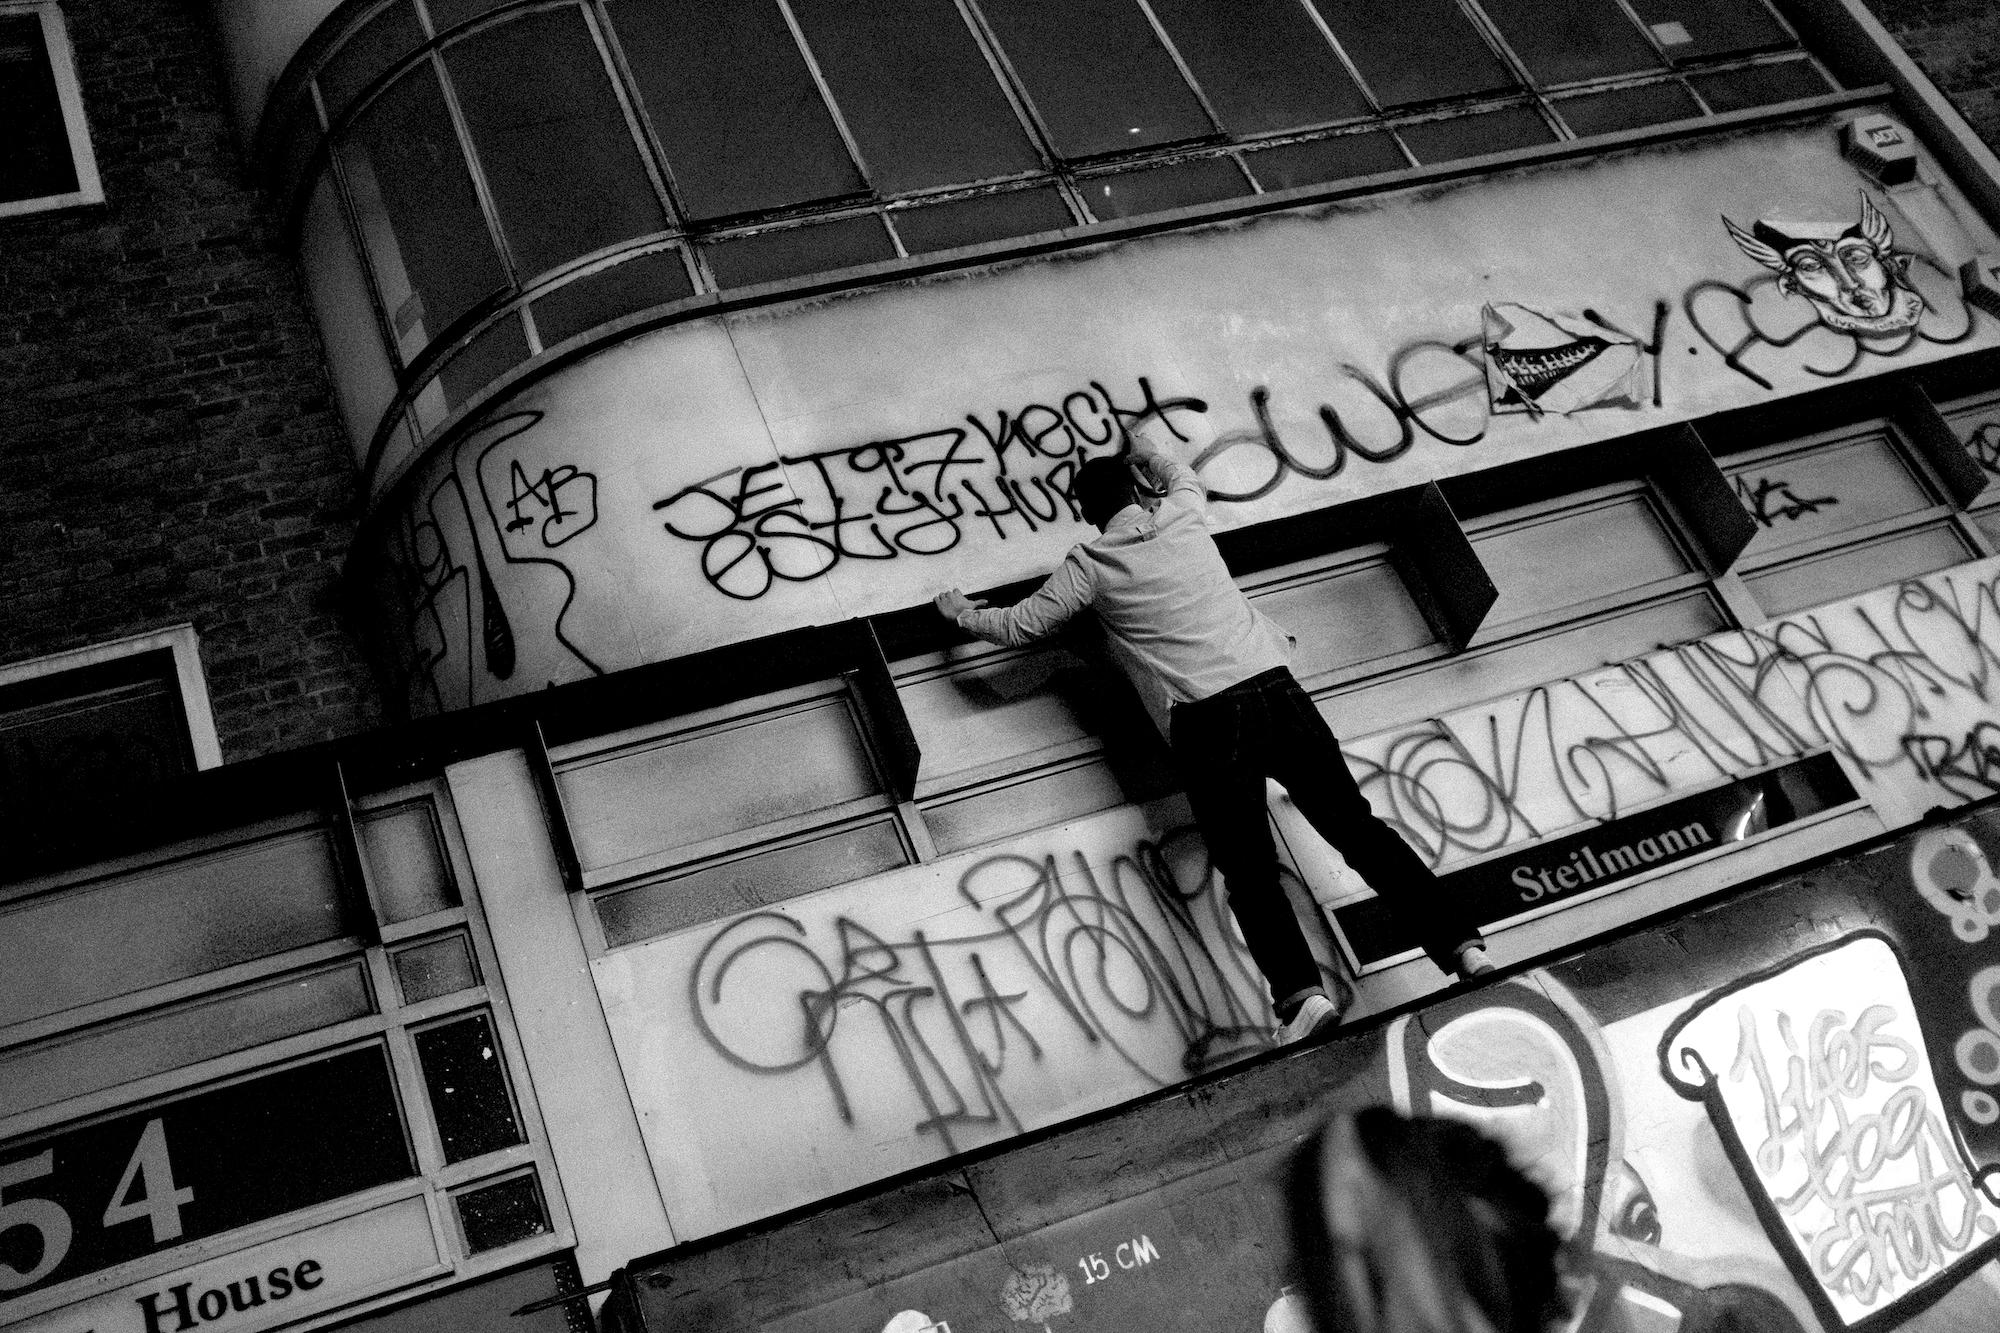 A graffiti writer on Thursday 21 March 2019 in London, England. © Marc Vallée